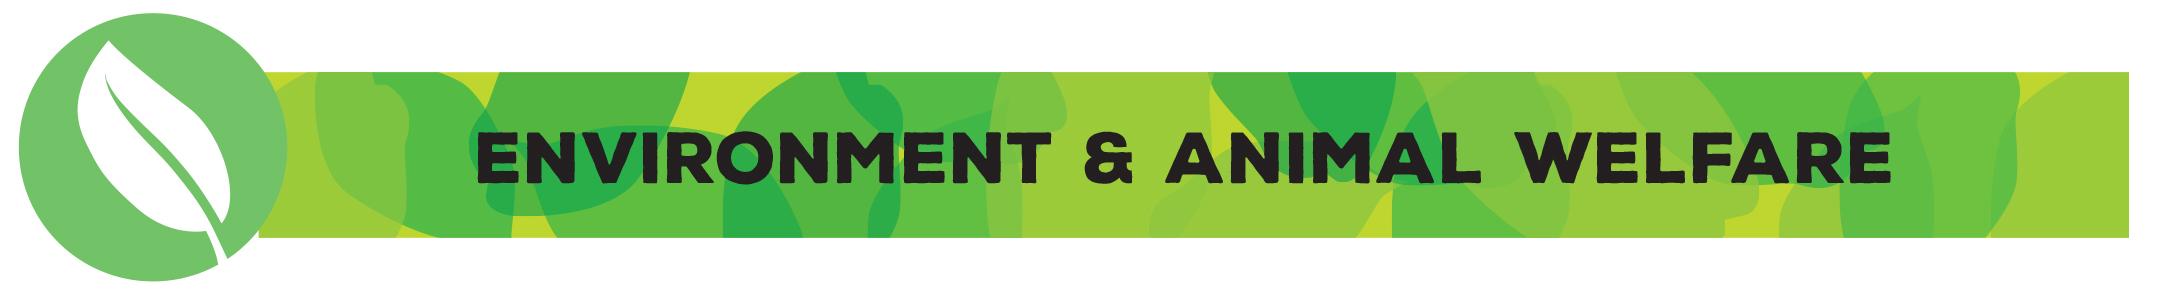 Environment-header-6in-PRINT